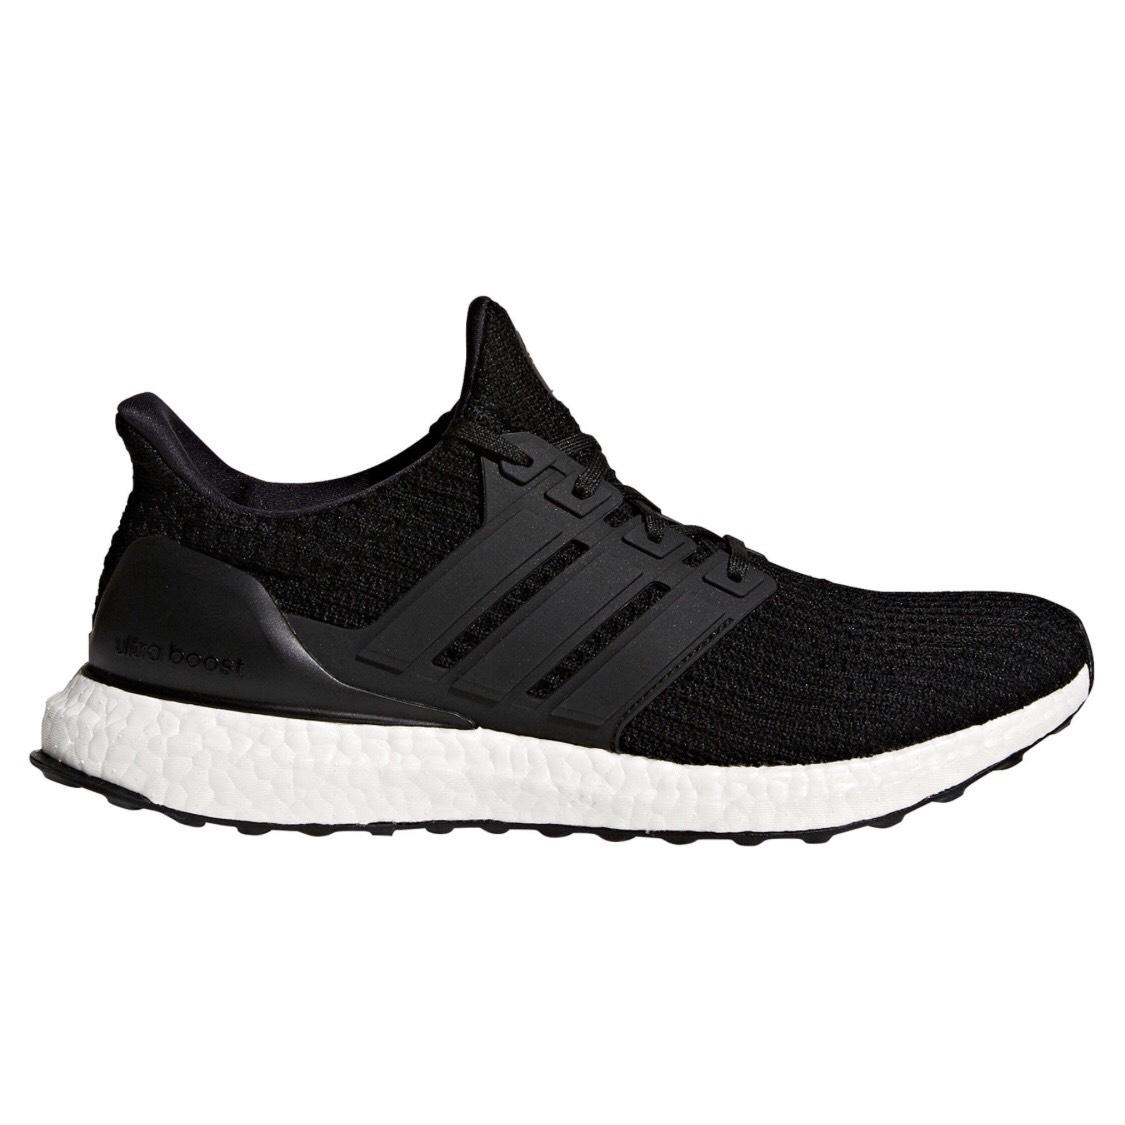 Adidas Ultra Boost 4.0 für 113,91€